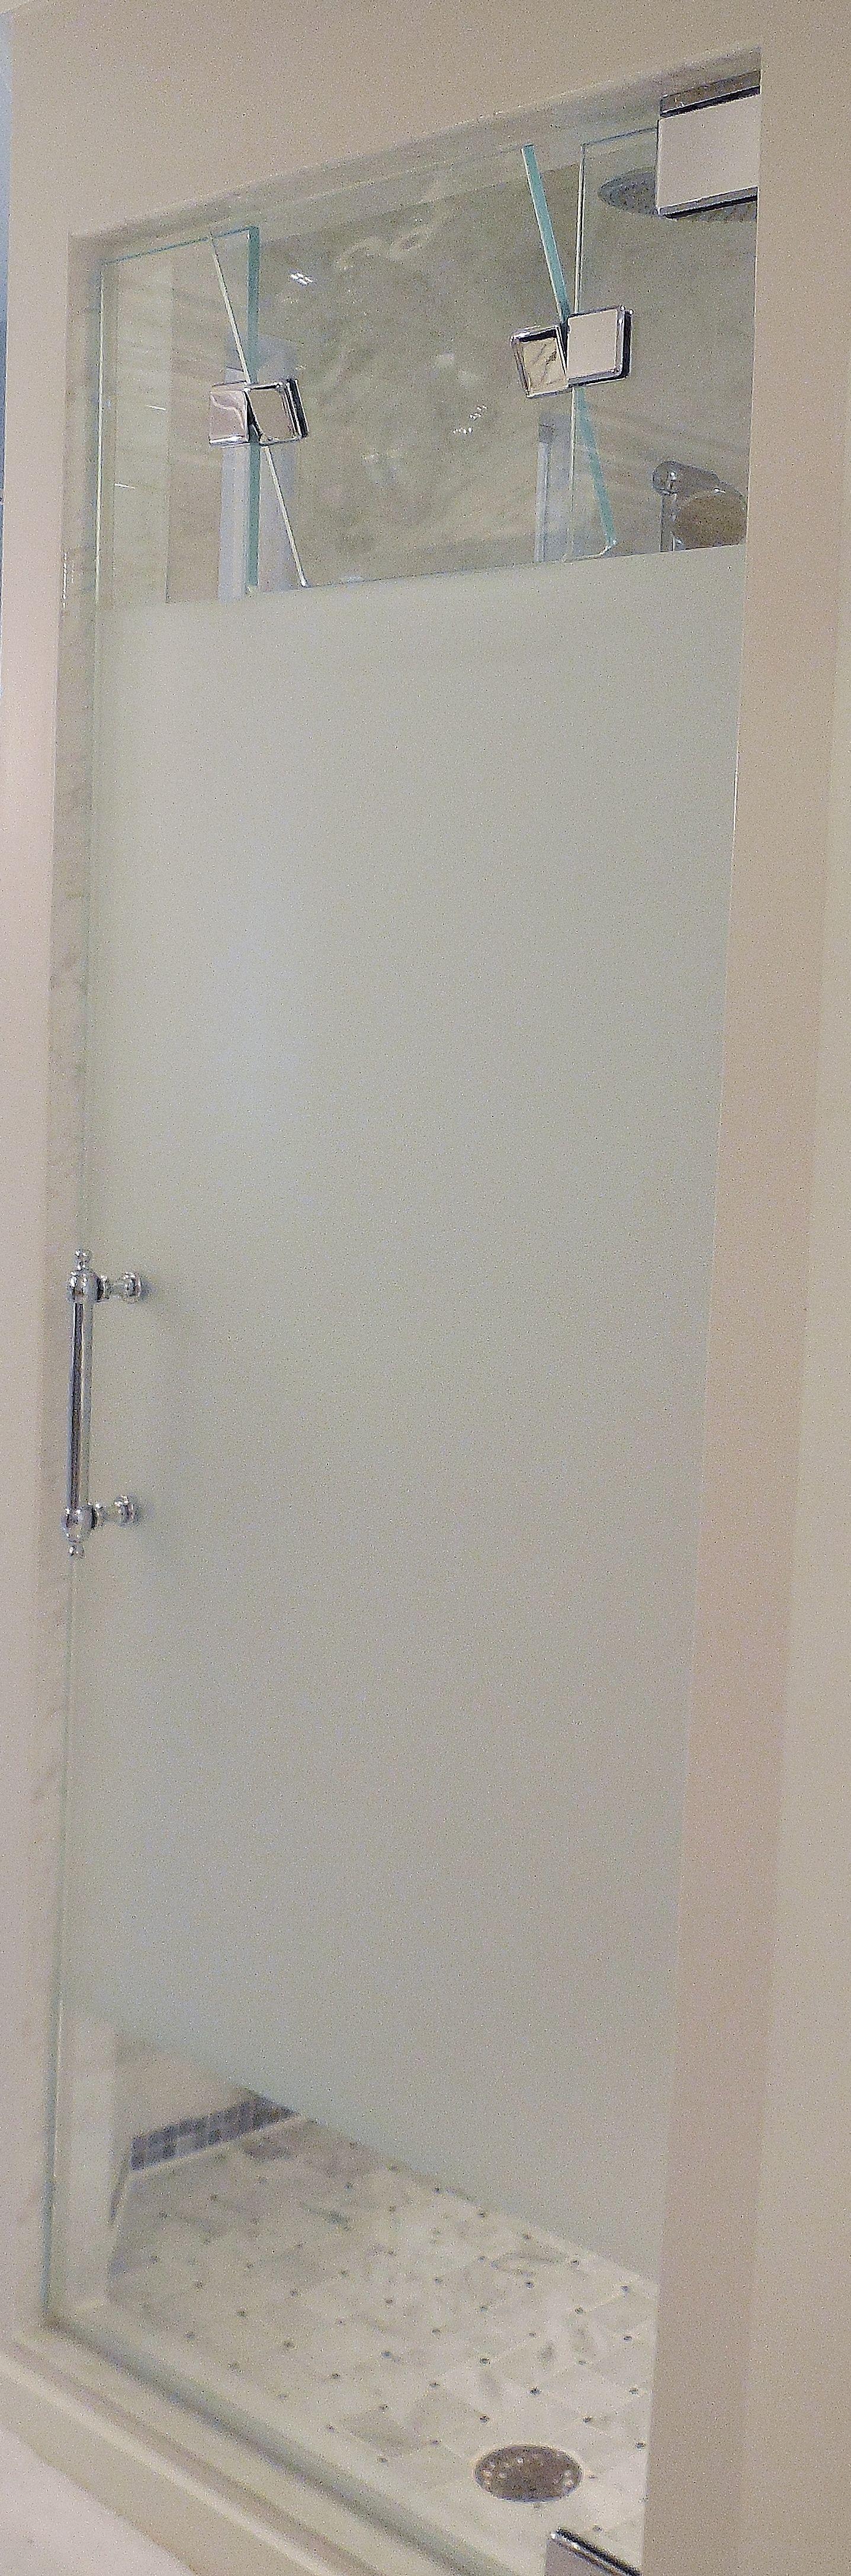 Frameless Steam Shower Enclosure Door With Privacy Ban Steam Door